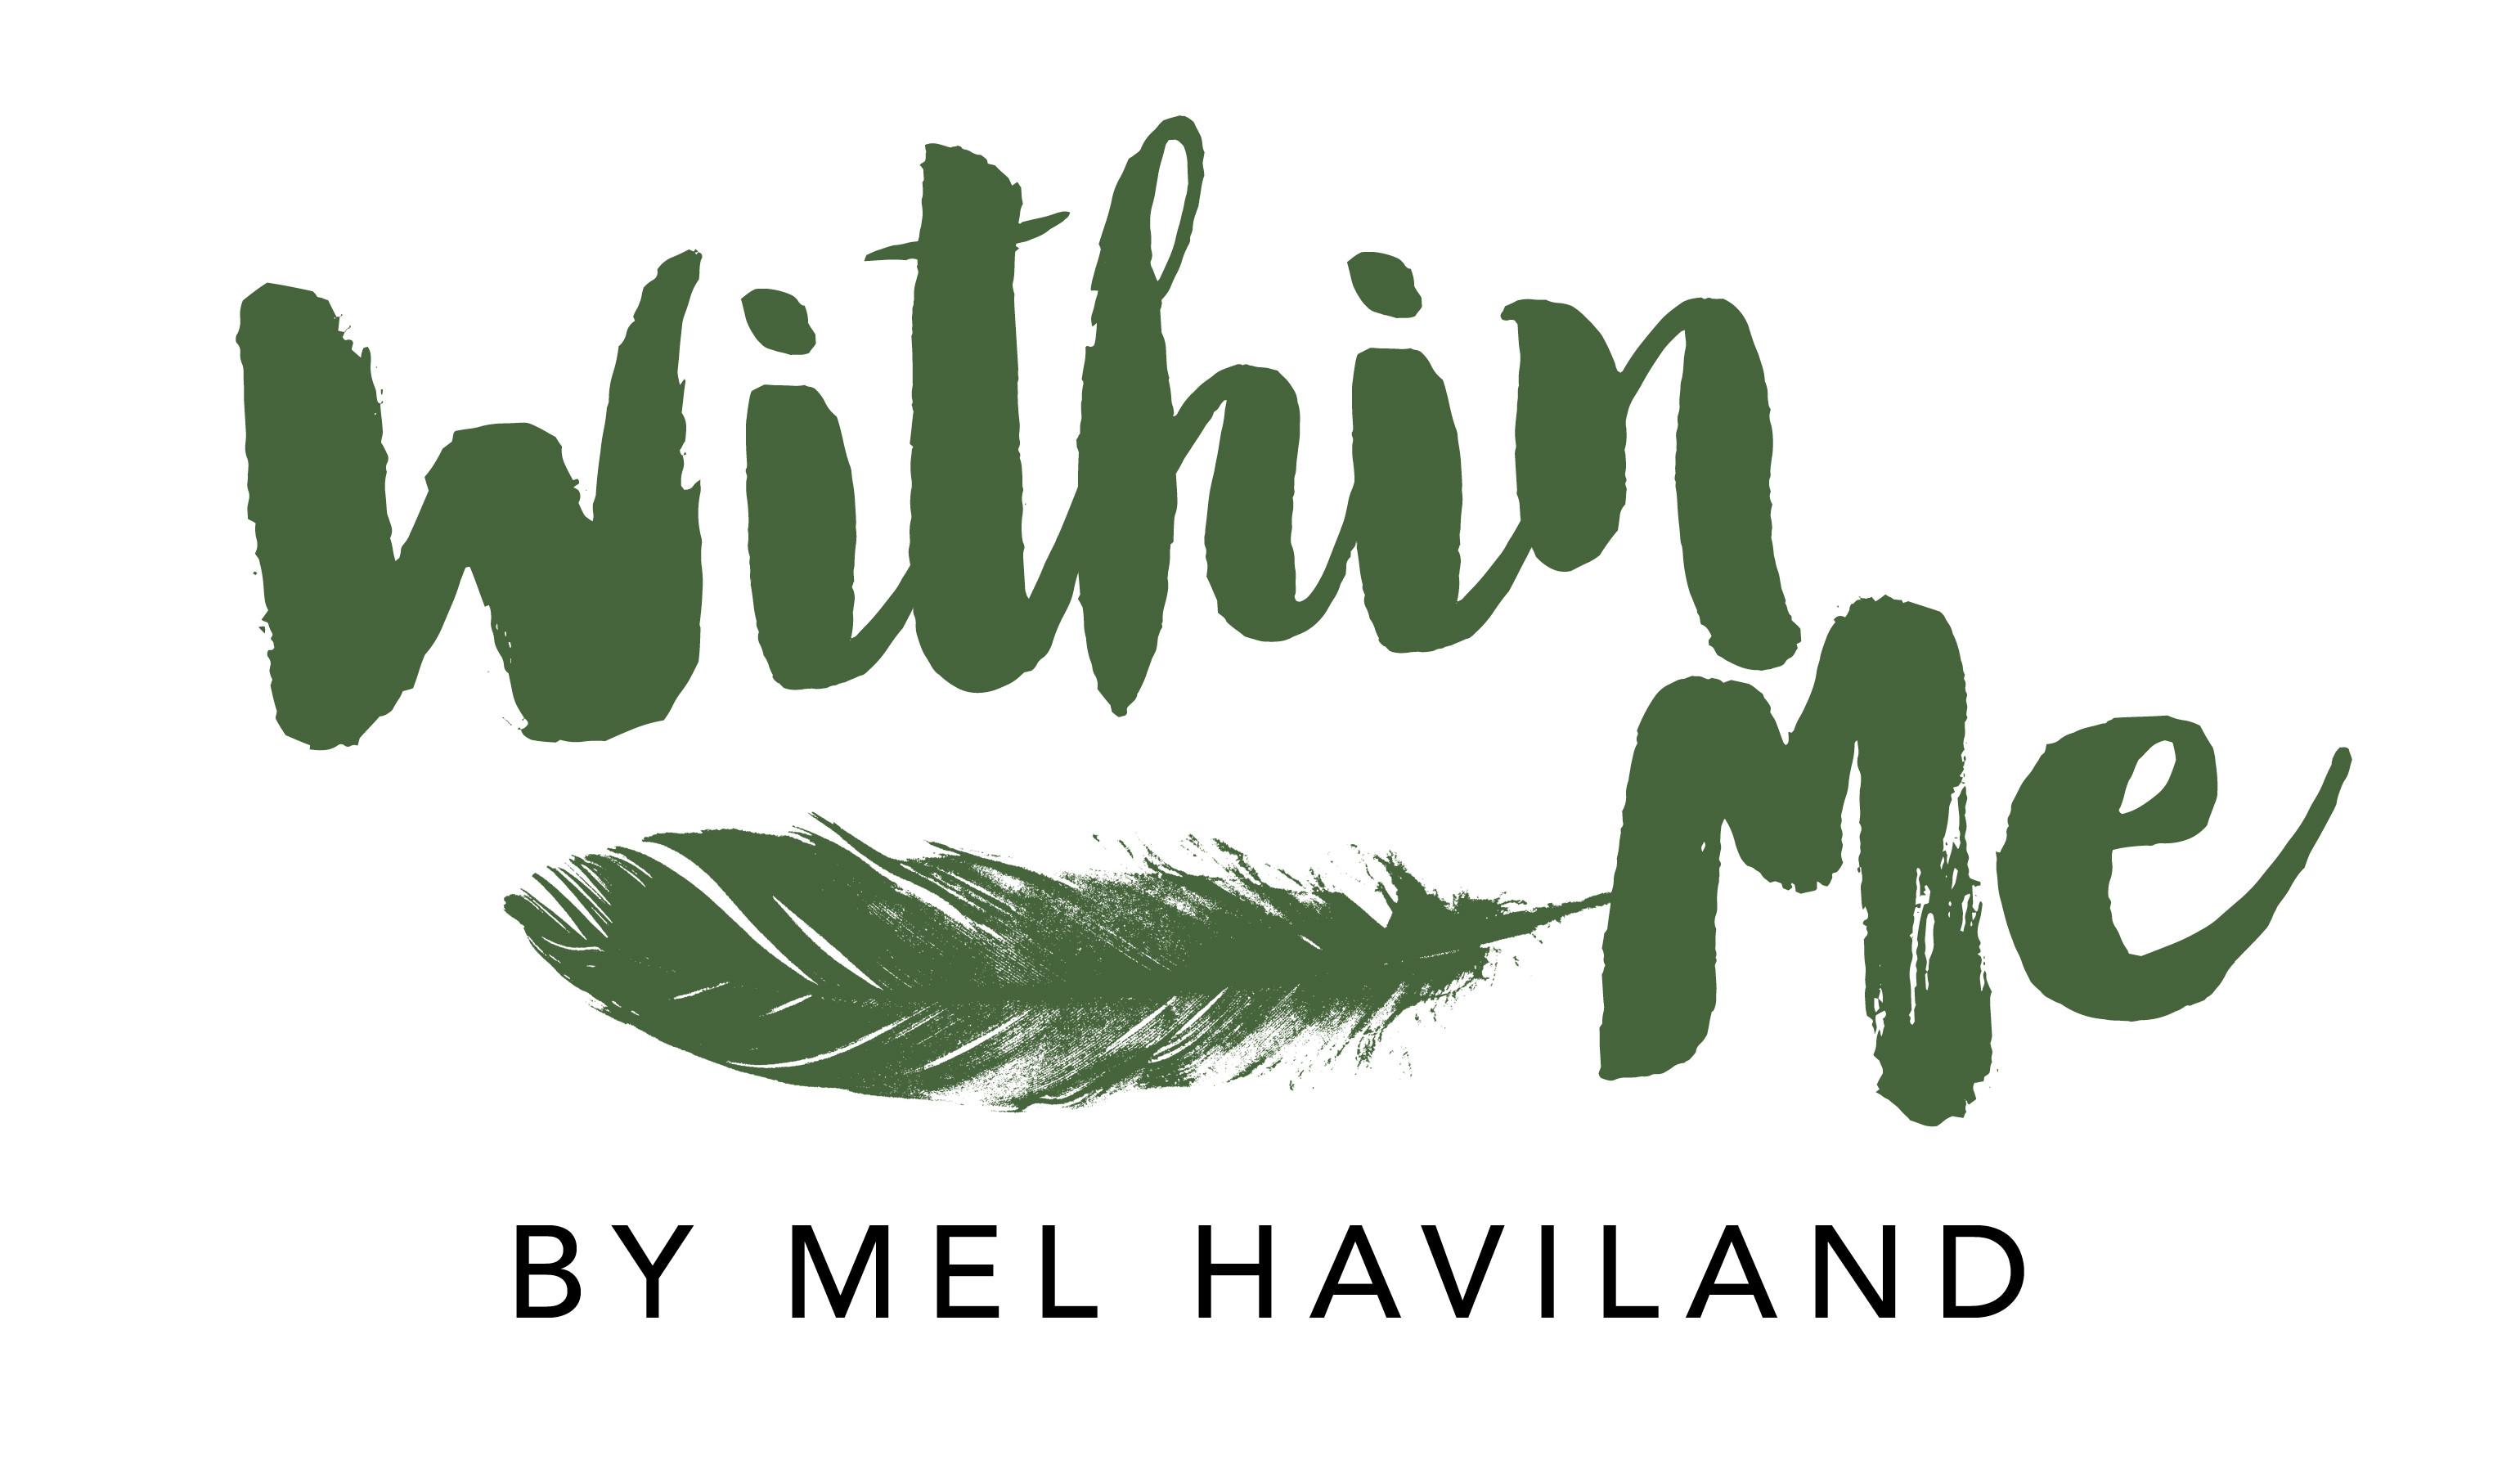 MEL HAVILAND - Gold Coast Celebrant and Reiki Healer